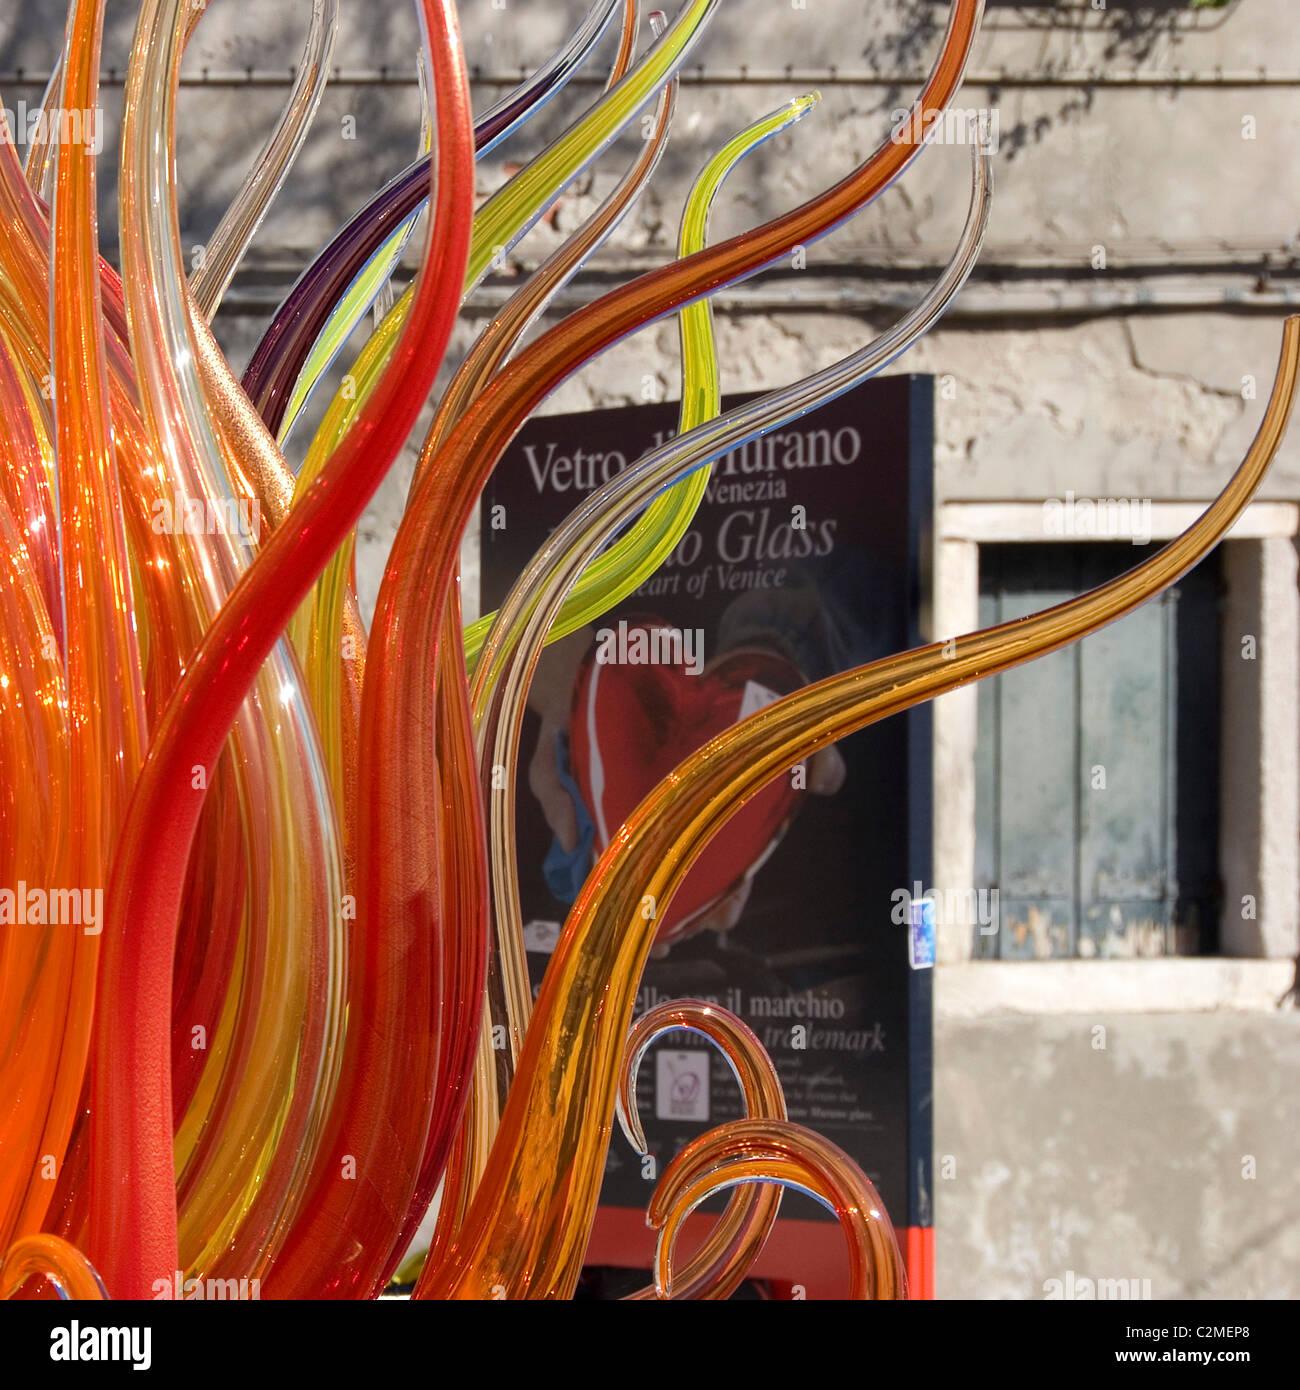 Fornace Mian, Murano, Vivarini Glass. - Stock Image